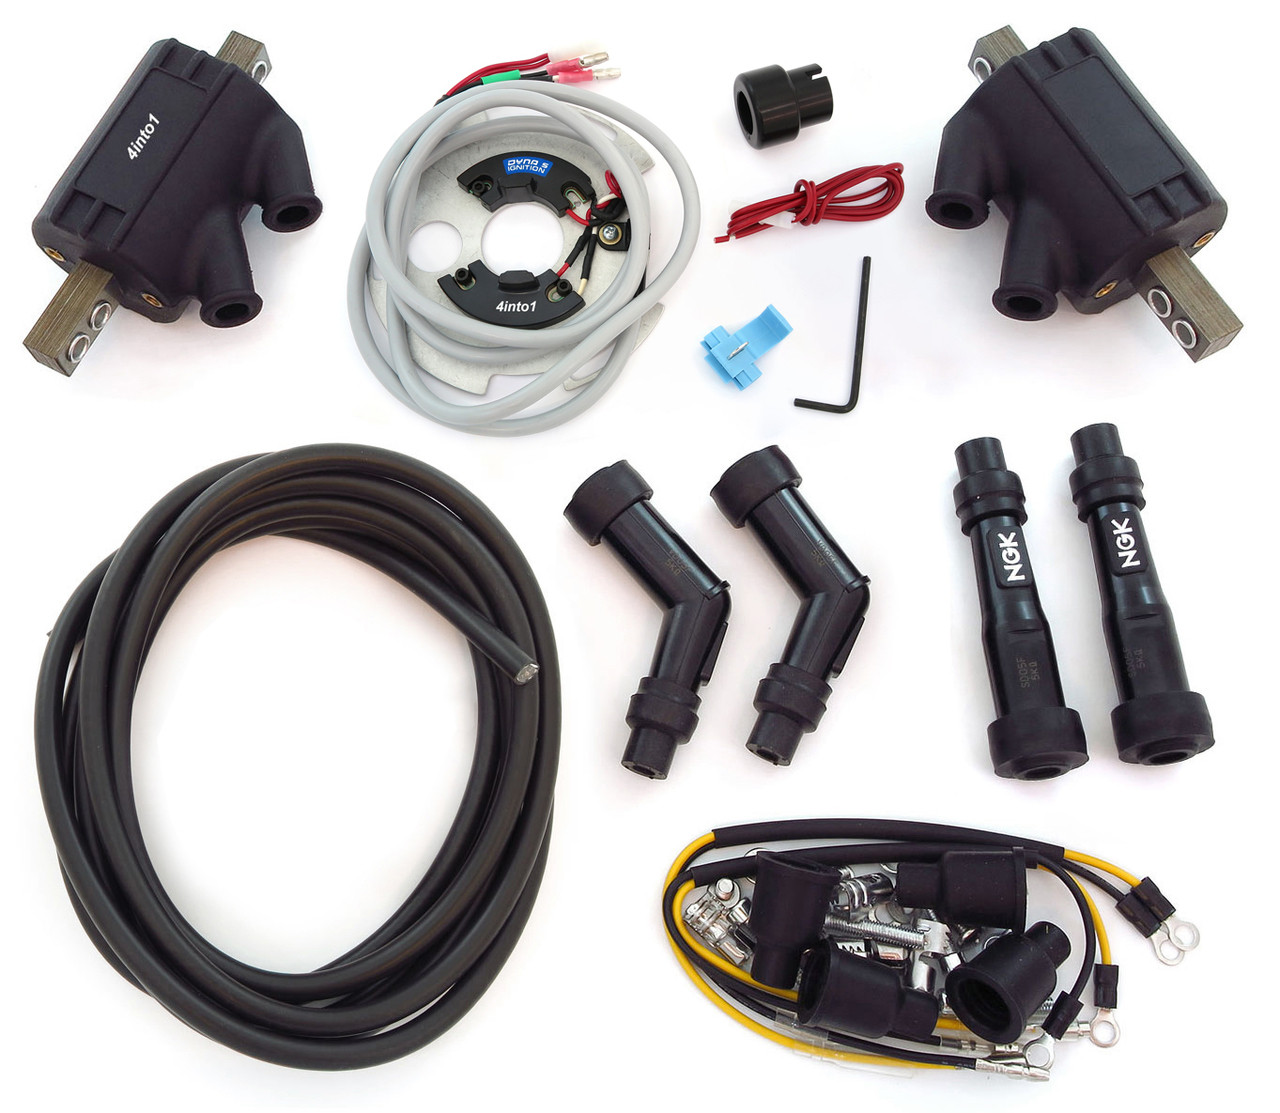 Electronic Ignition Kit - Dynatek - Kawasaki KZ900 Z1 on ninja 250r wiring diagram, kz440 wiring diagram, vulcan 1500 wiring diagram, zl1000 wiring diagram, kz200 wiring diagram, kz750 wiring diagram, kz650 wiring diagram, ex250 wiring diagram, ex500 wiring diagram, kz400 wiring diagram, ke175 wiring diagram, zx7r wiring diagram, zx12 wiring diagram, klr650 wiring diagram, kz550 wiring diagram, kawasaki wiring diagram, gs400 wiring diagram, z1000 wiring diagram, kz1000 wiring diagram, vn1500 wiring diagram,